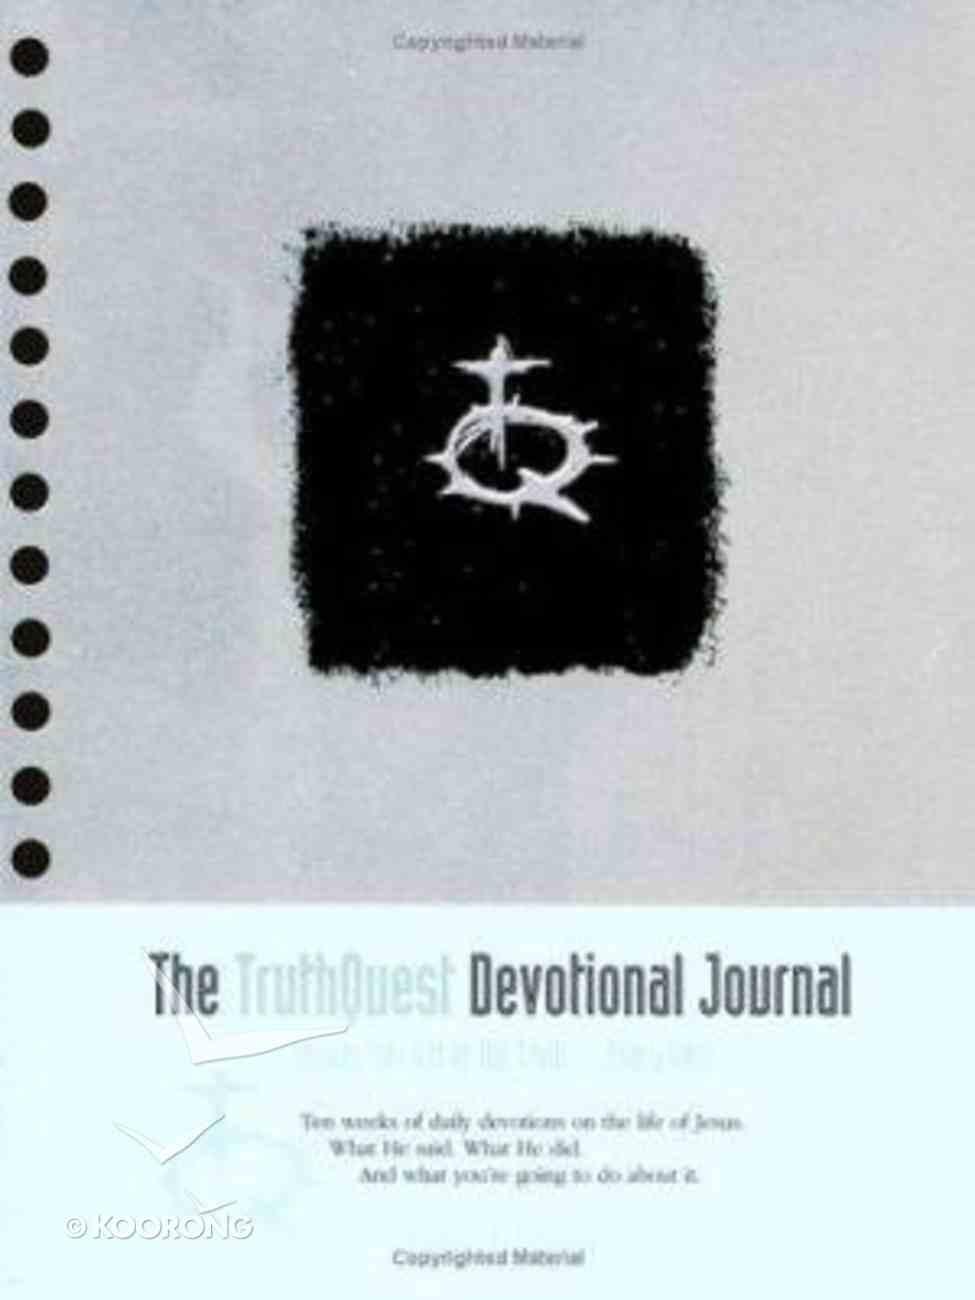 Truthquest Devotional Journal (Truthquest Series) Spiral